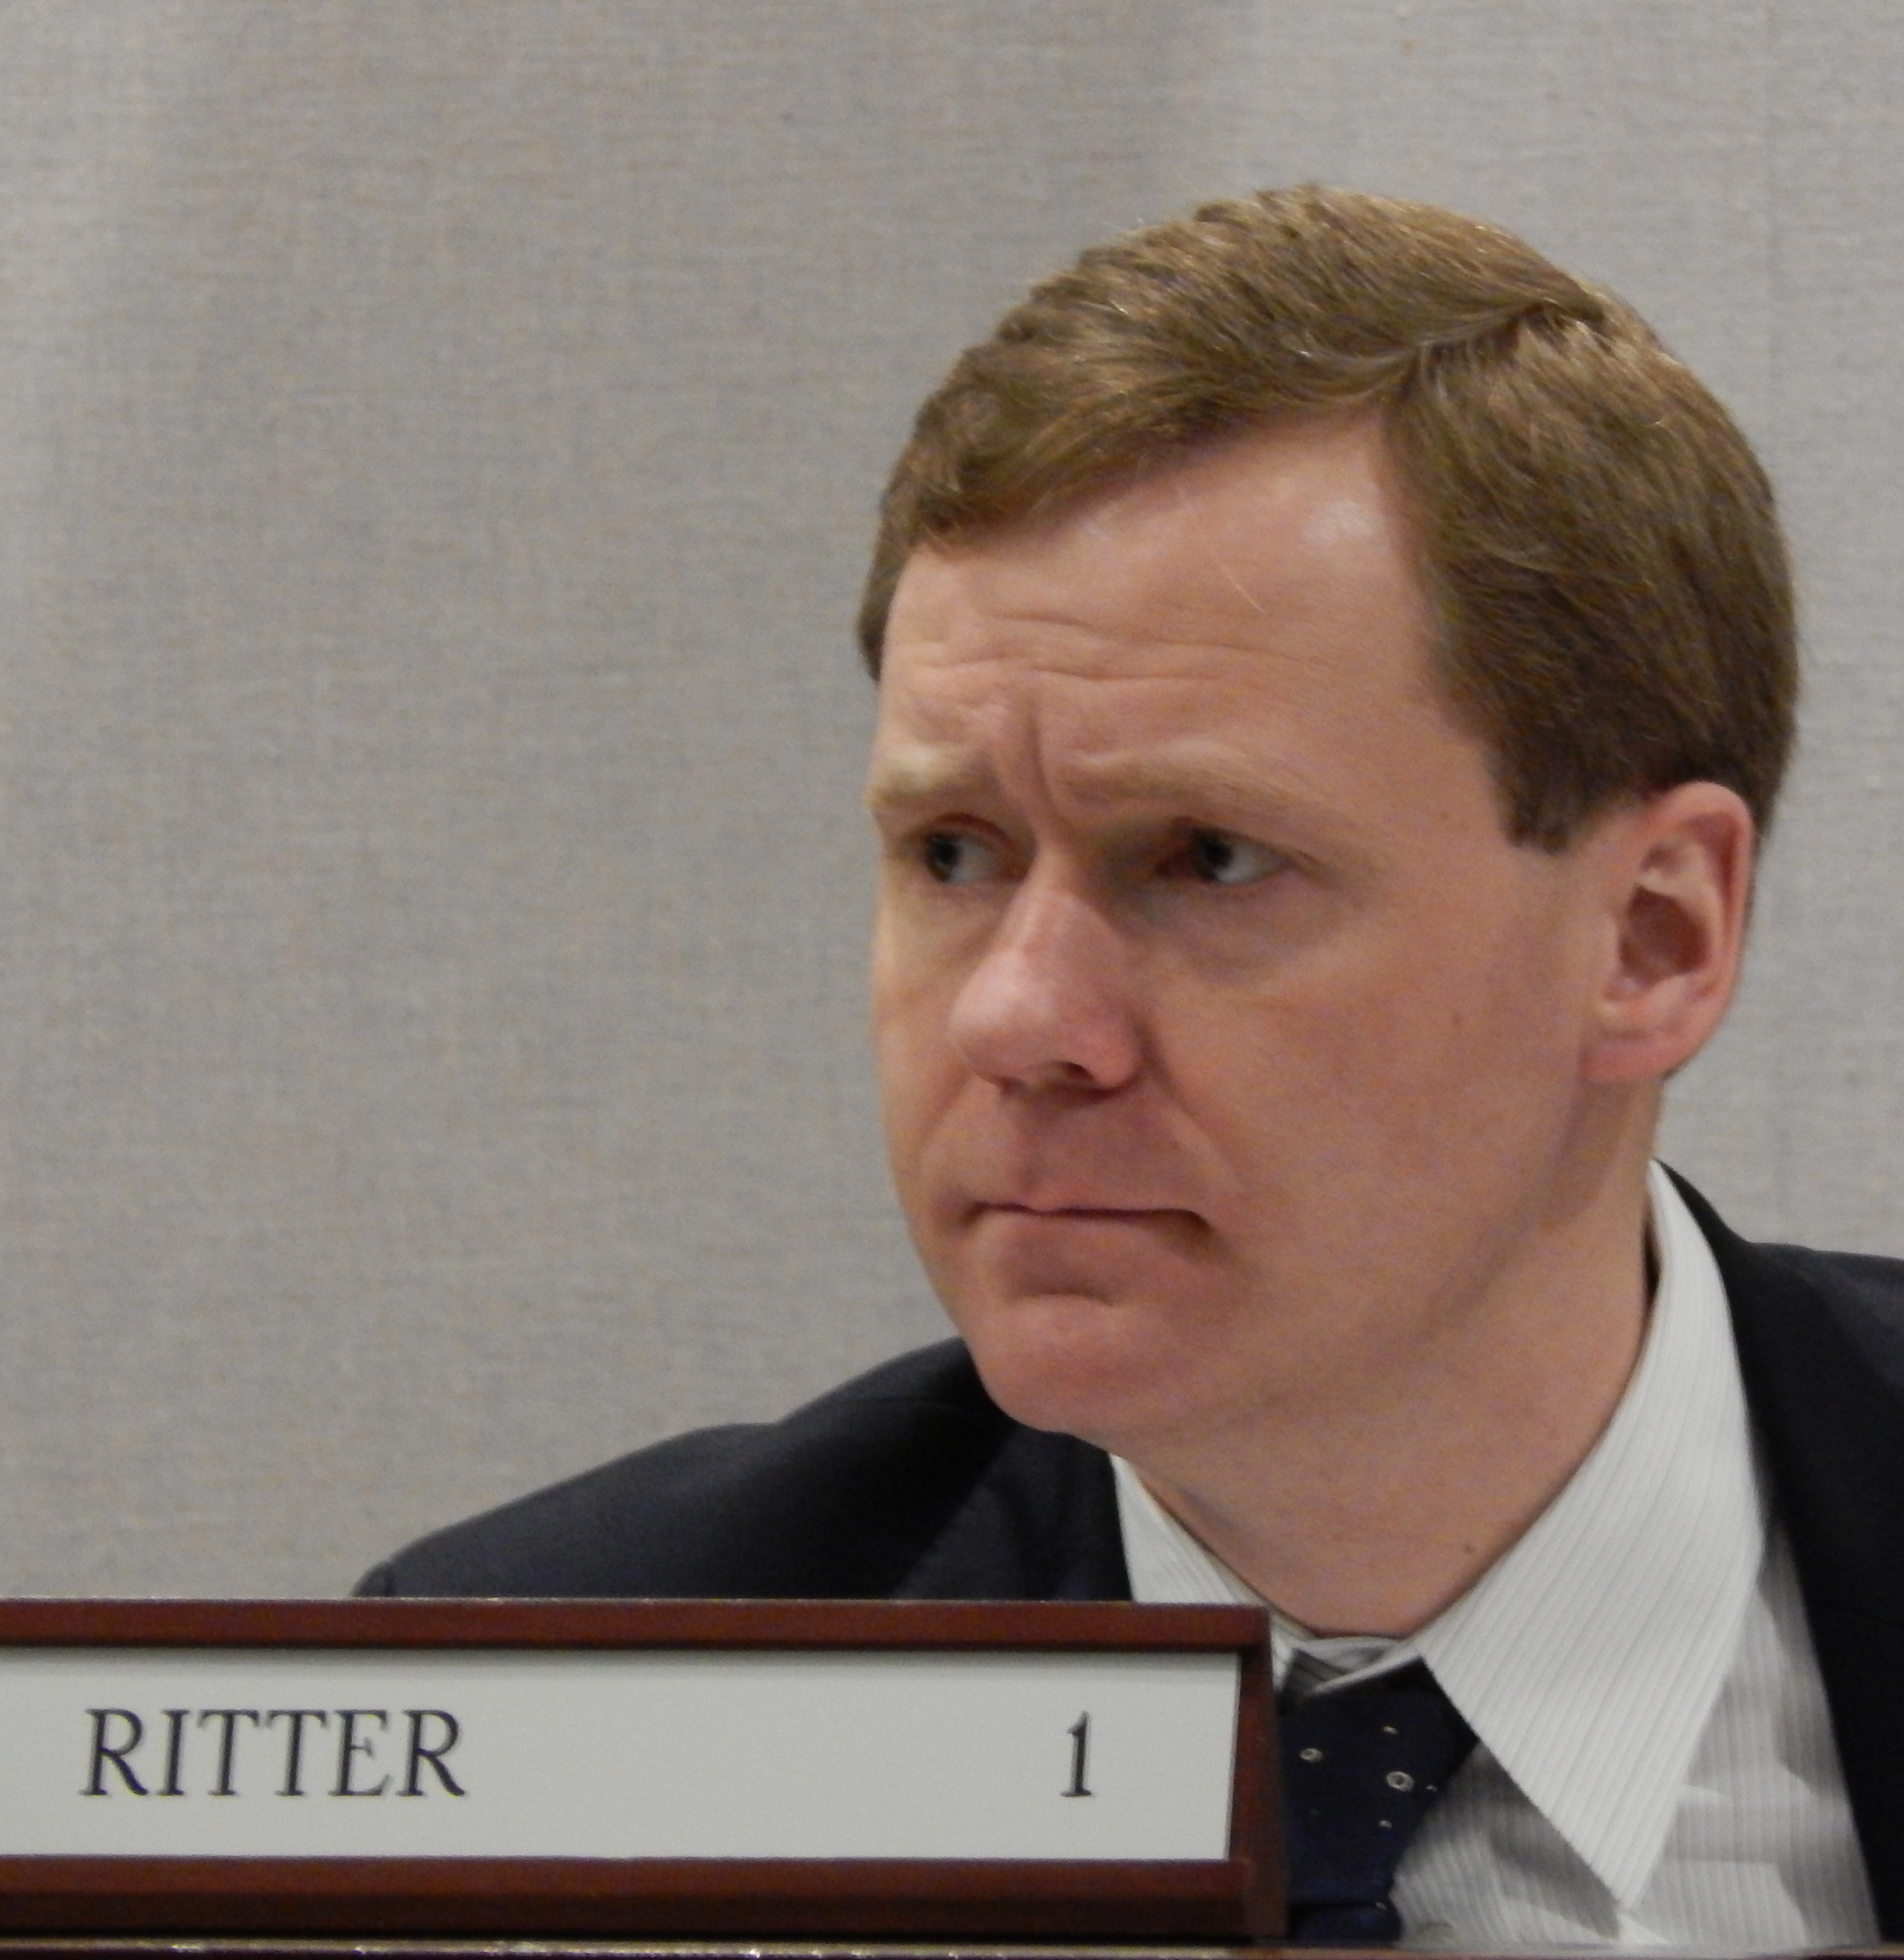 If Democrats win, Matt Ritter to be next CT House majority leader